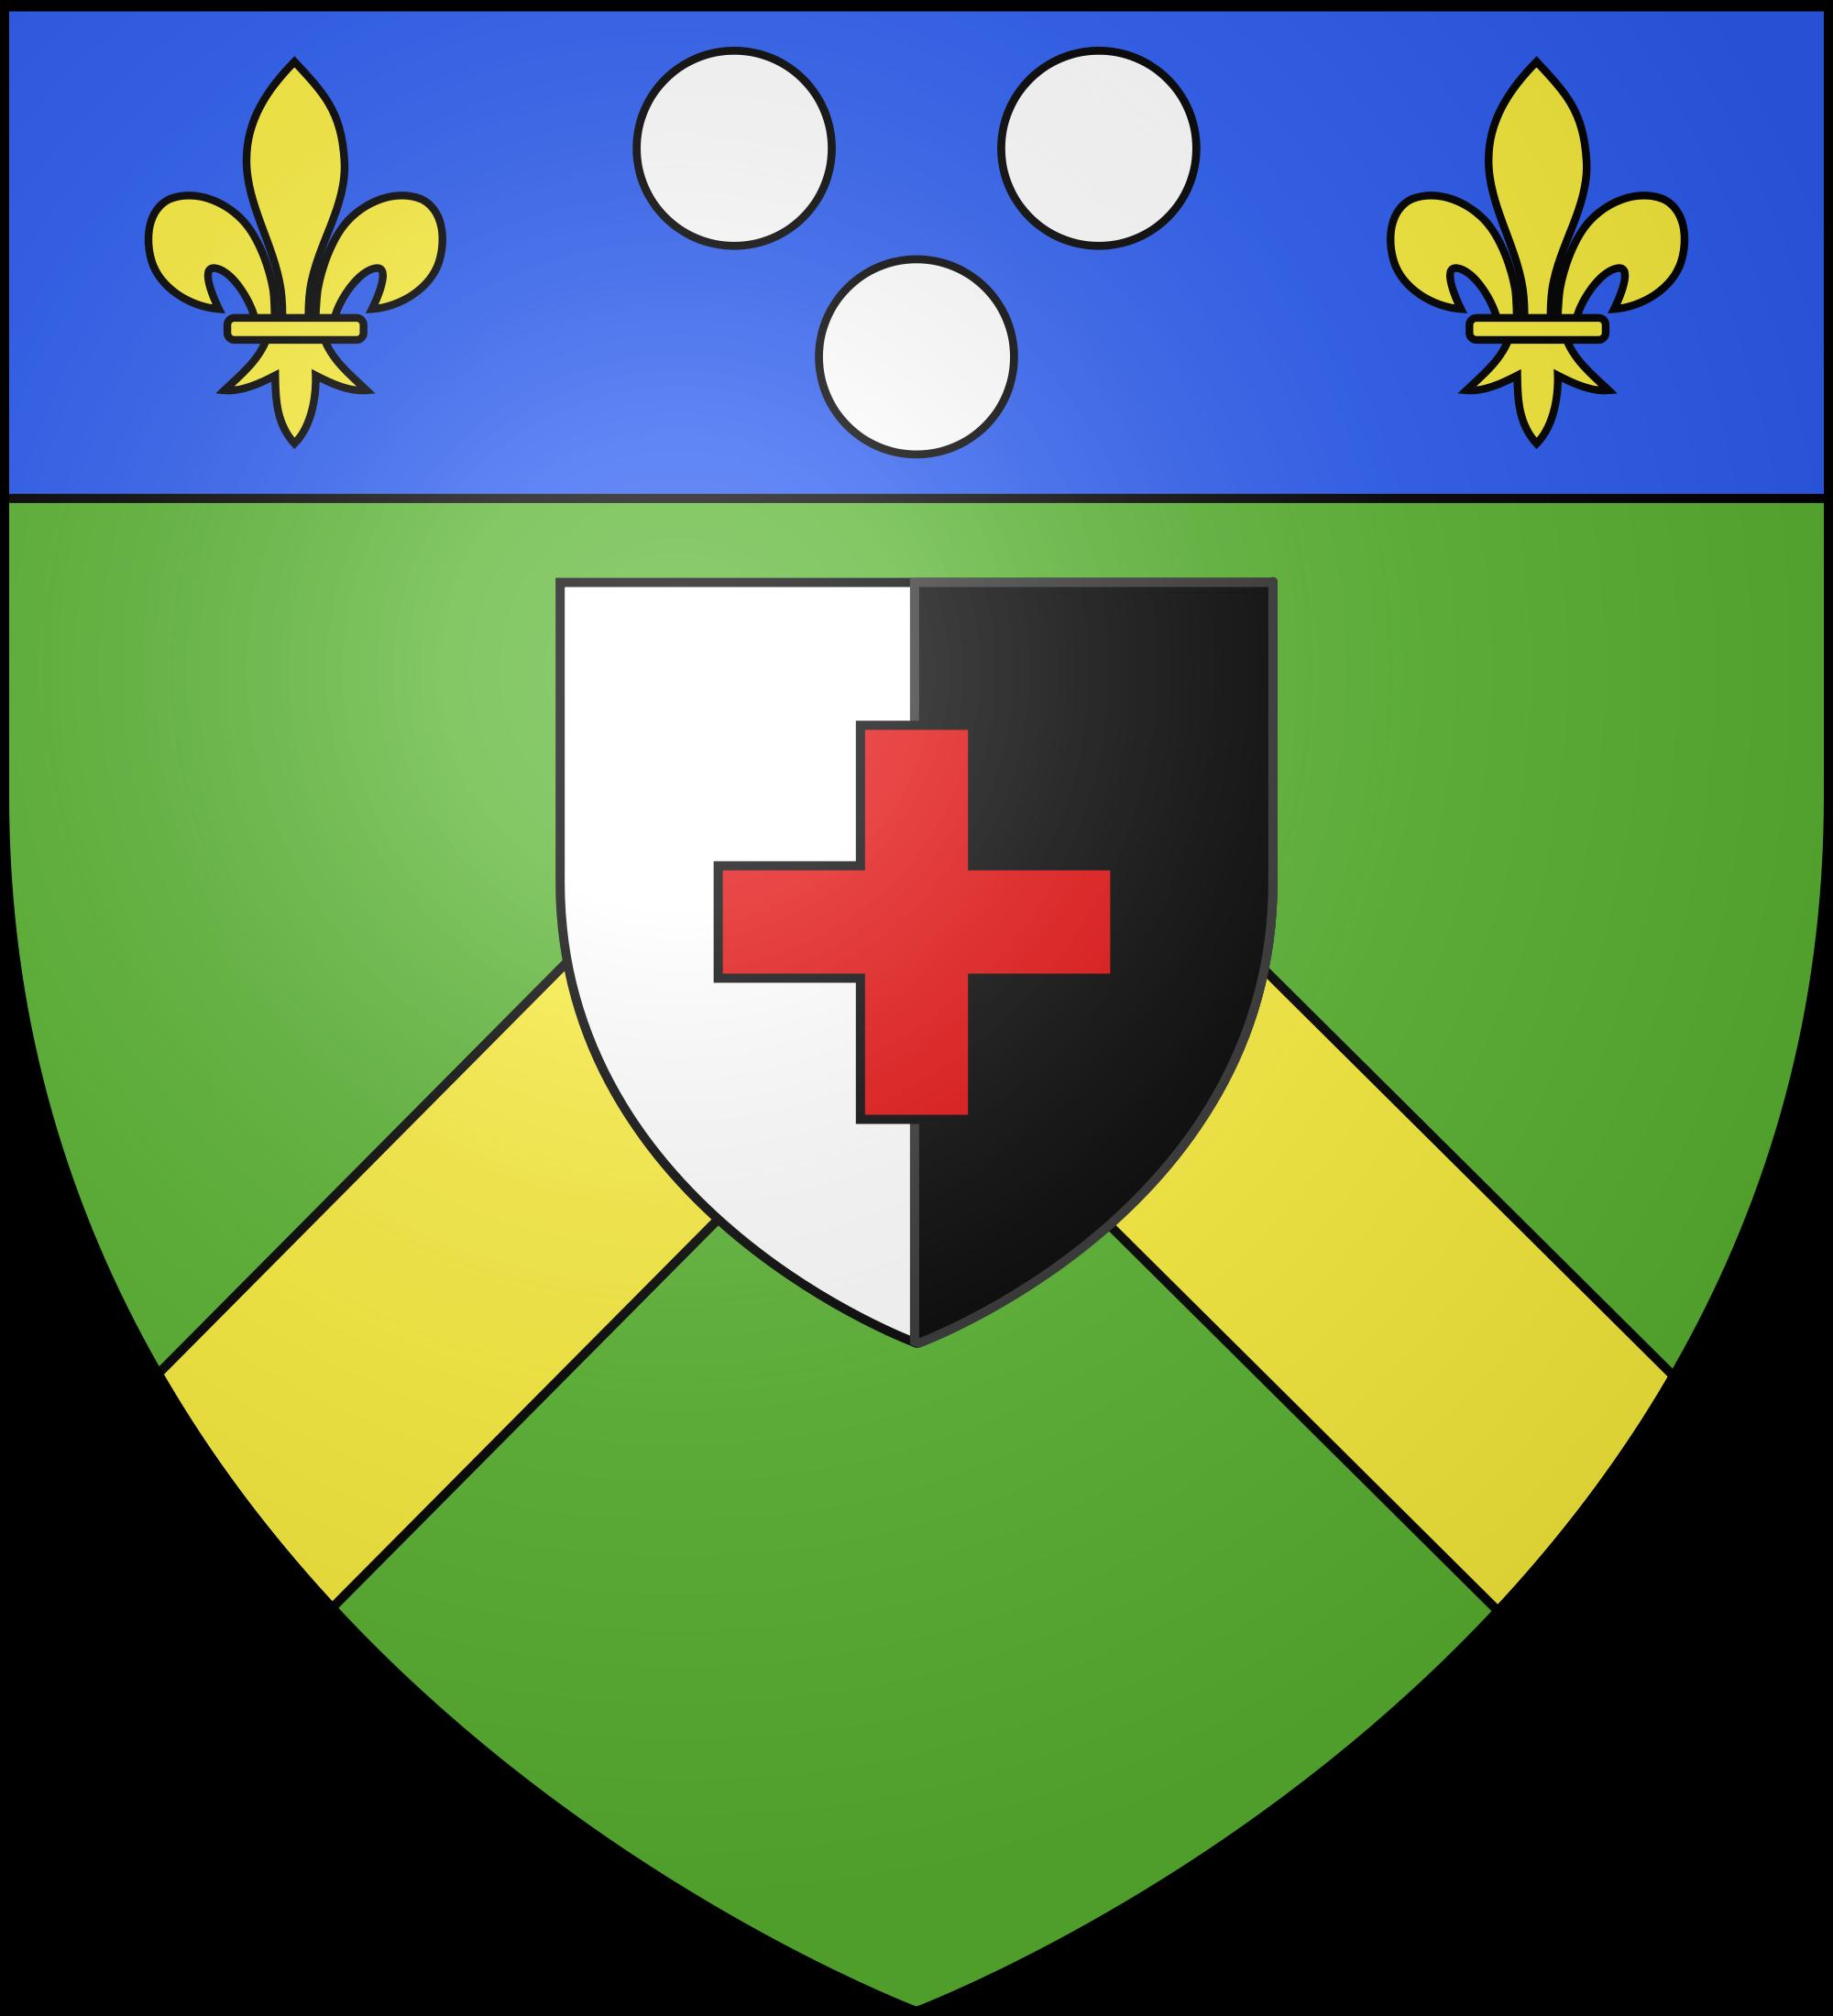 File:Blason ville fr Elancourt (Yvelines).svg.